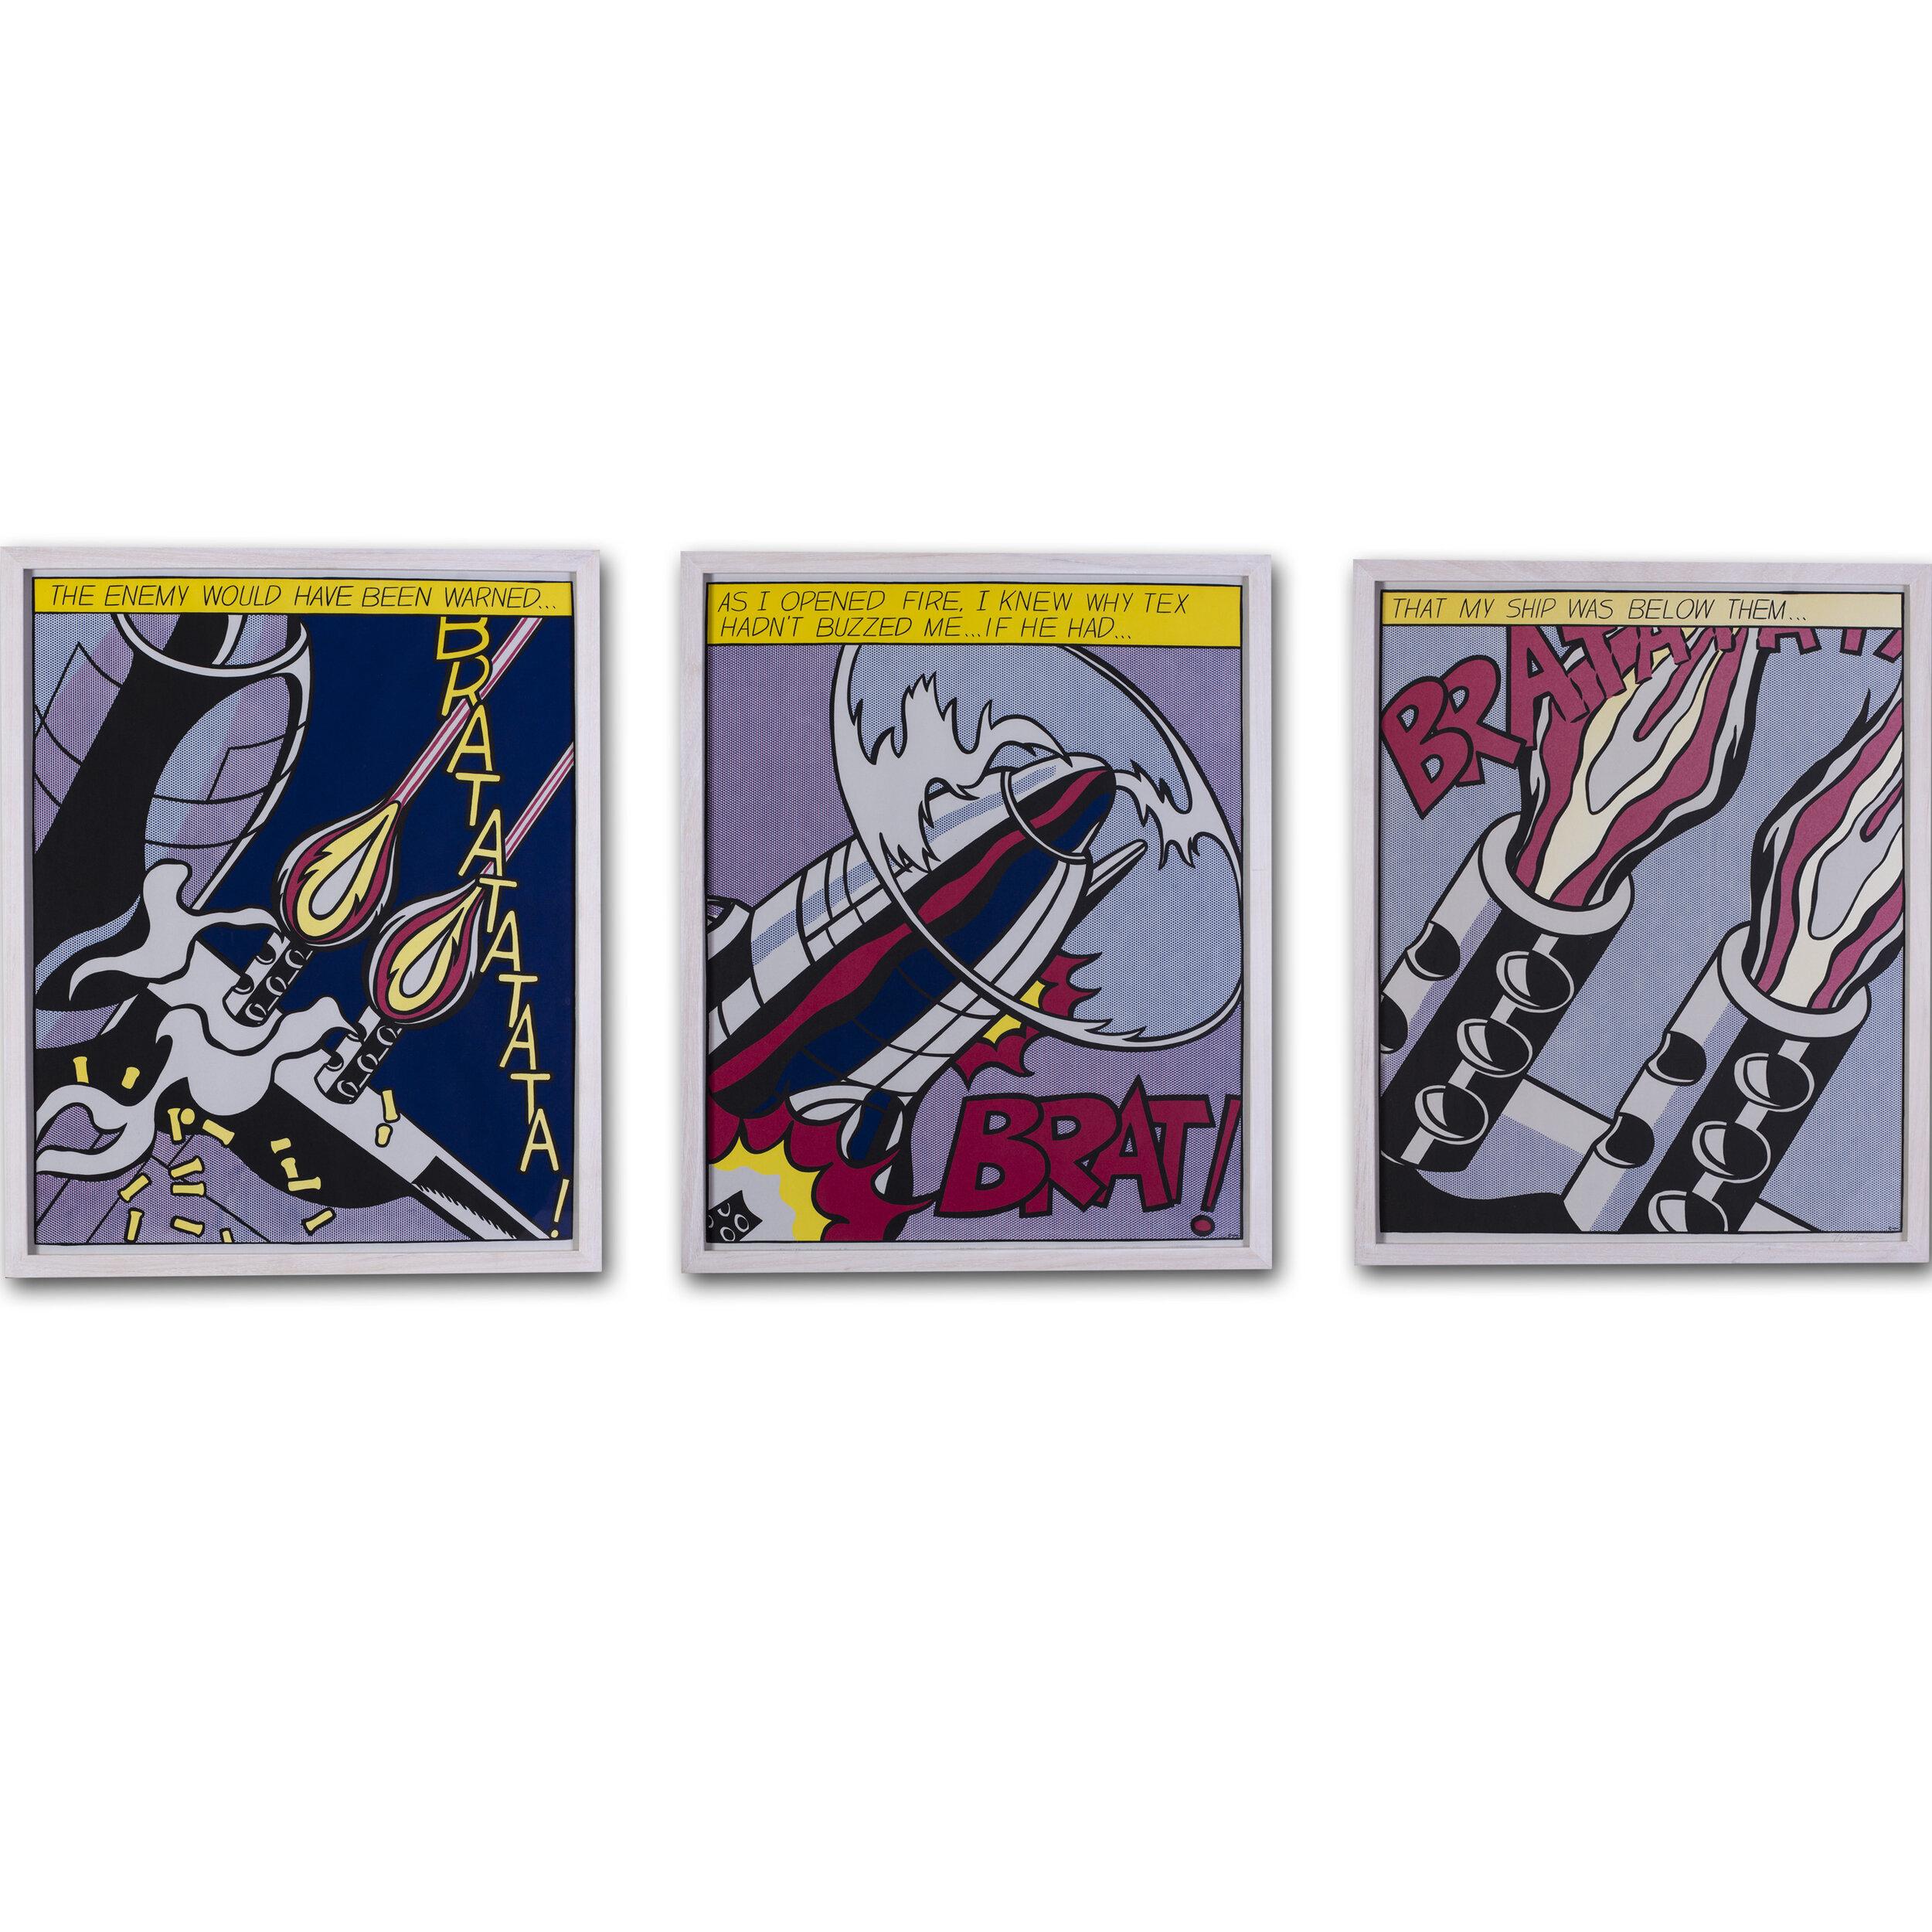 Roy Lichtenstein     As I opened fire    (set of 3)    Price: £5,200